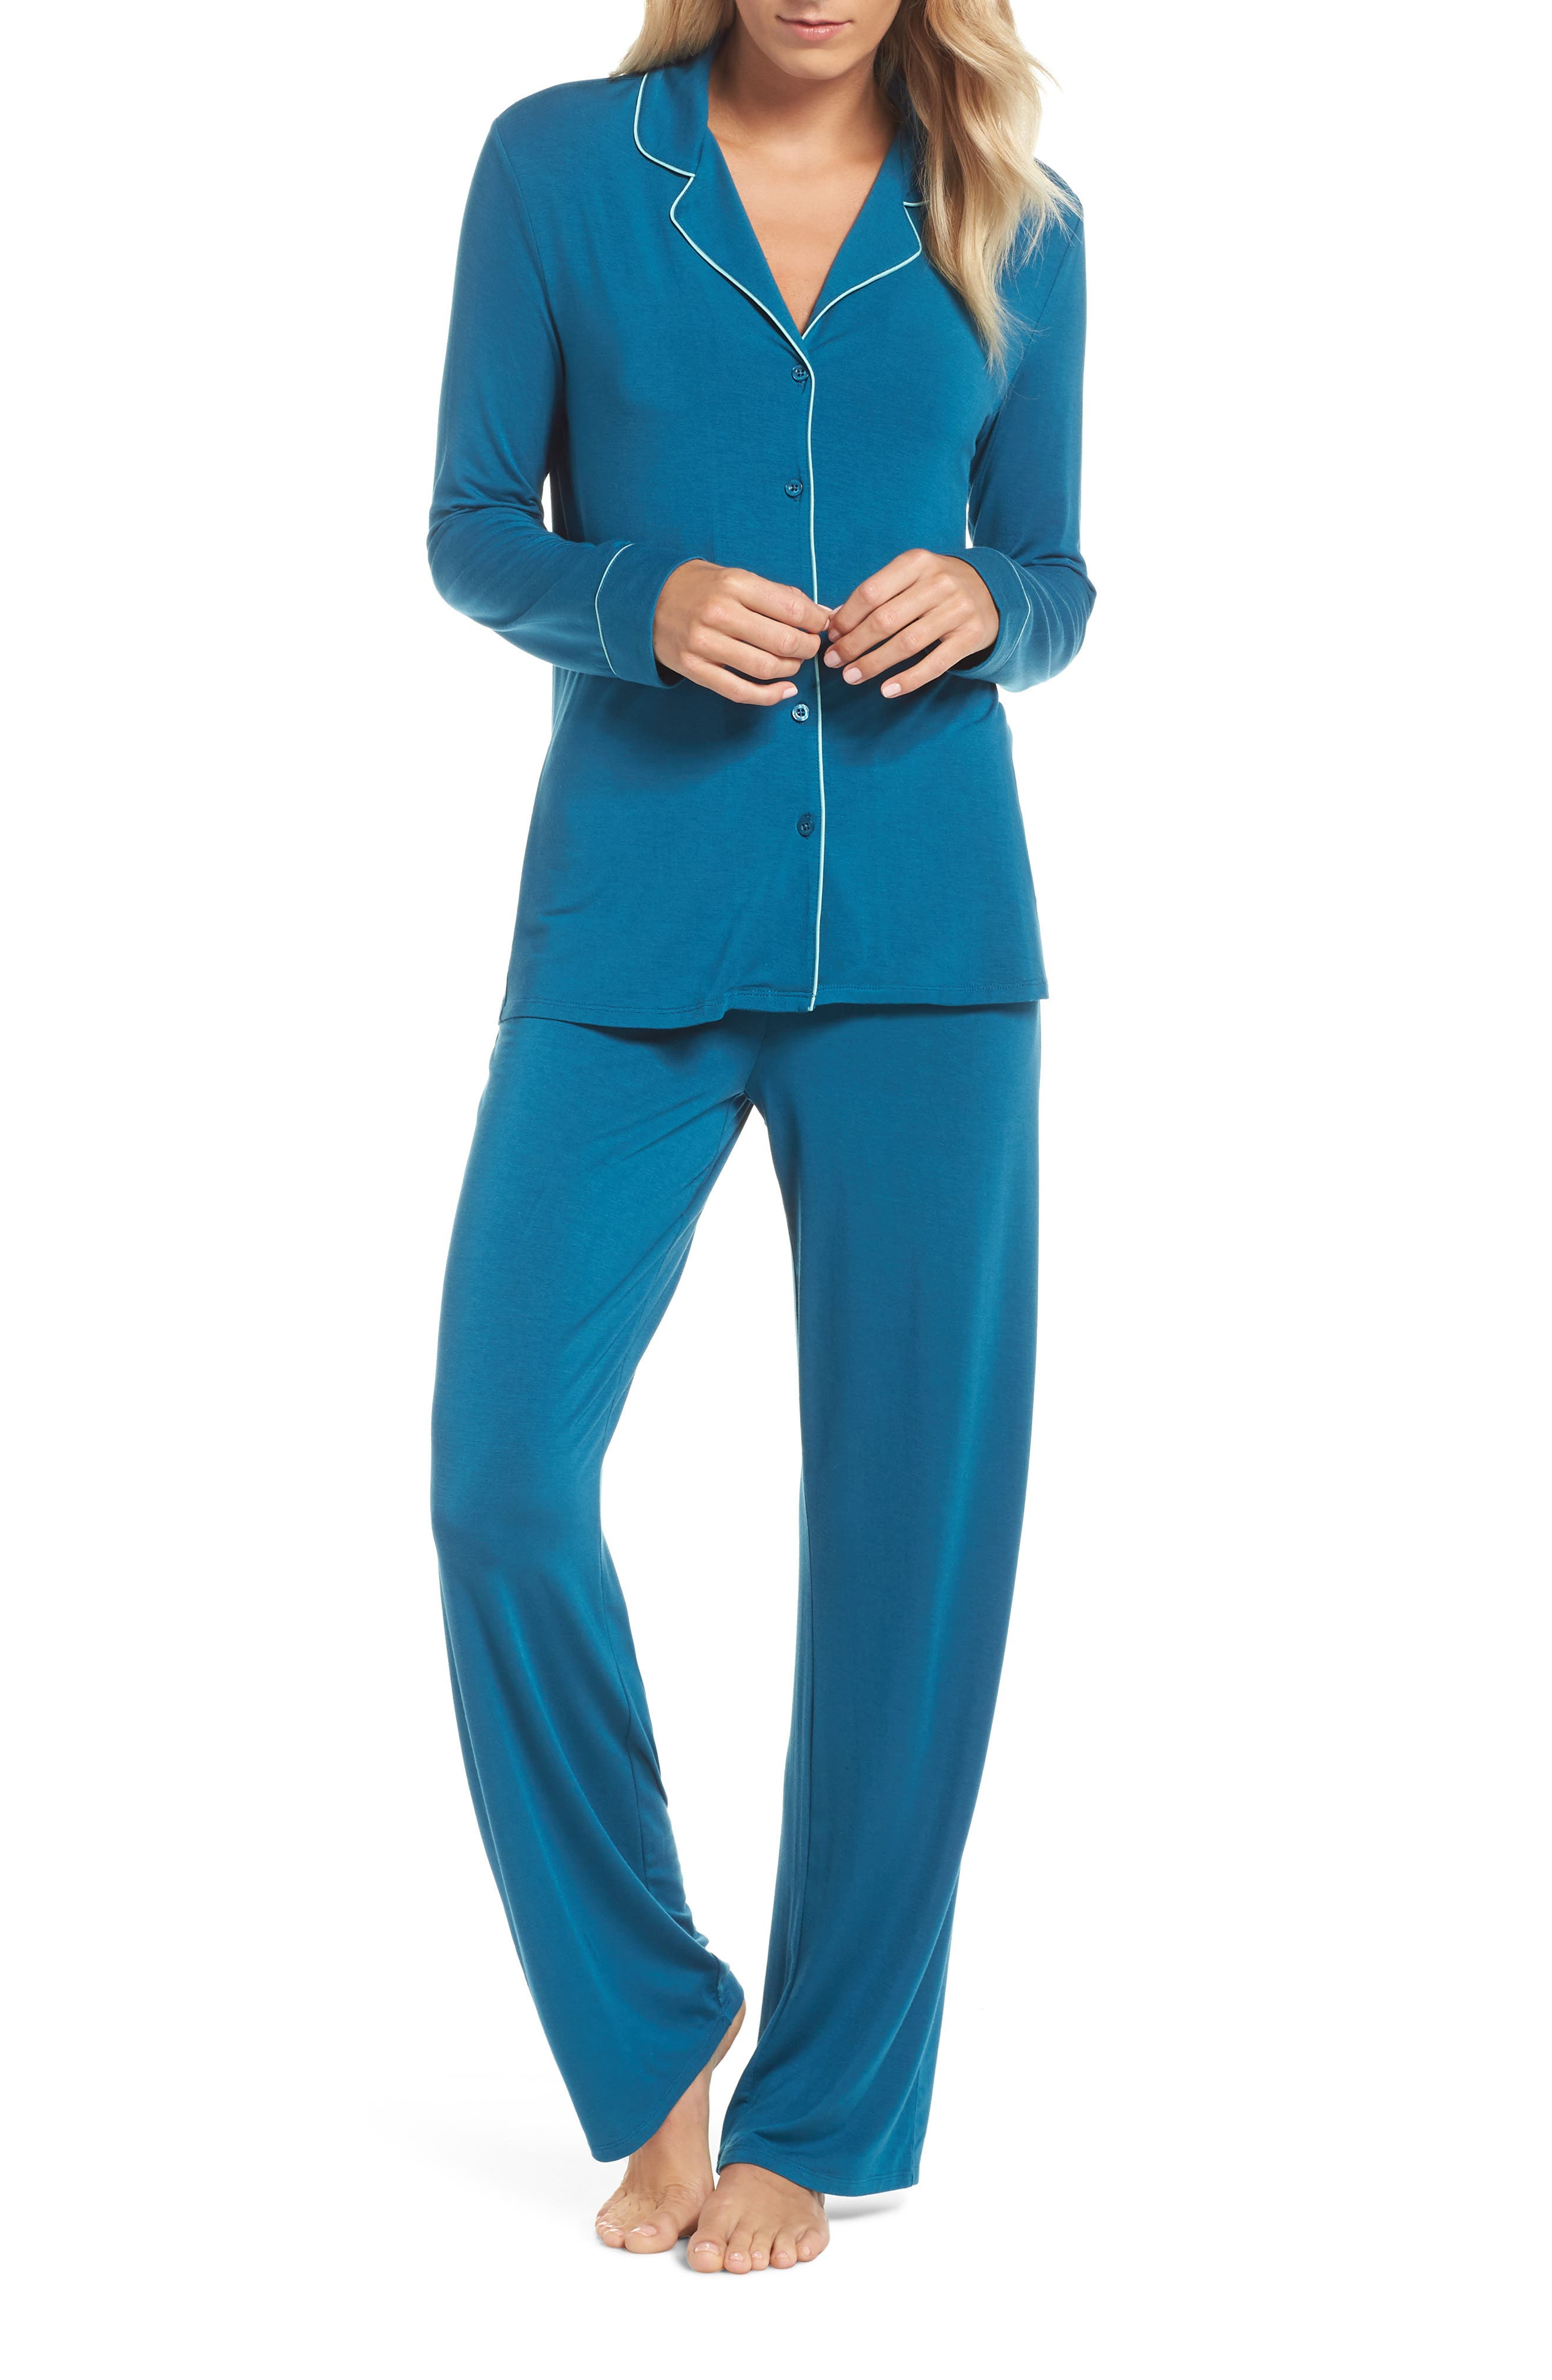 Nordstrom Lingerie Moonlight Pajamas, Blue/green